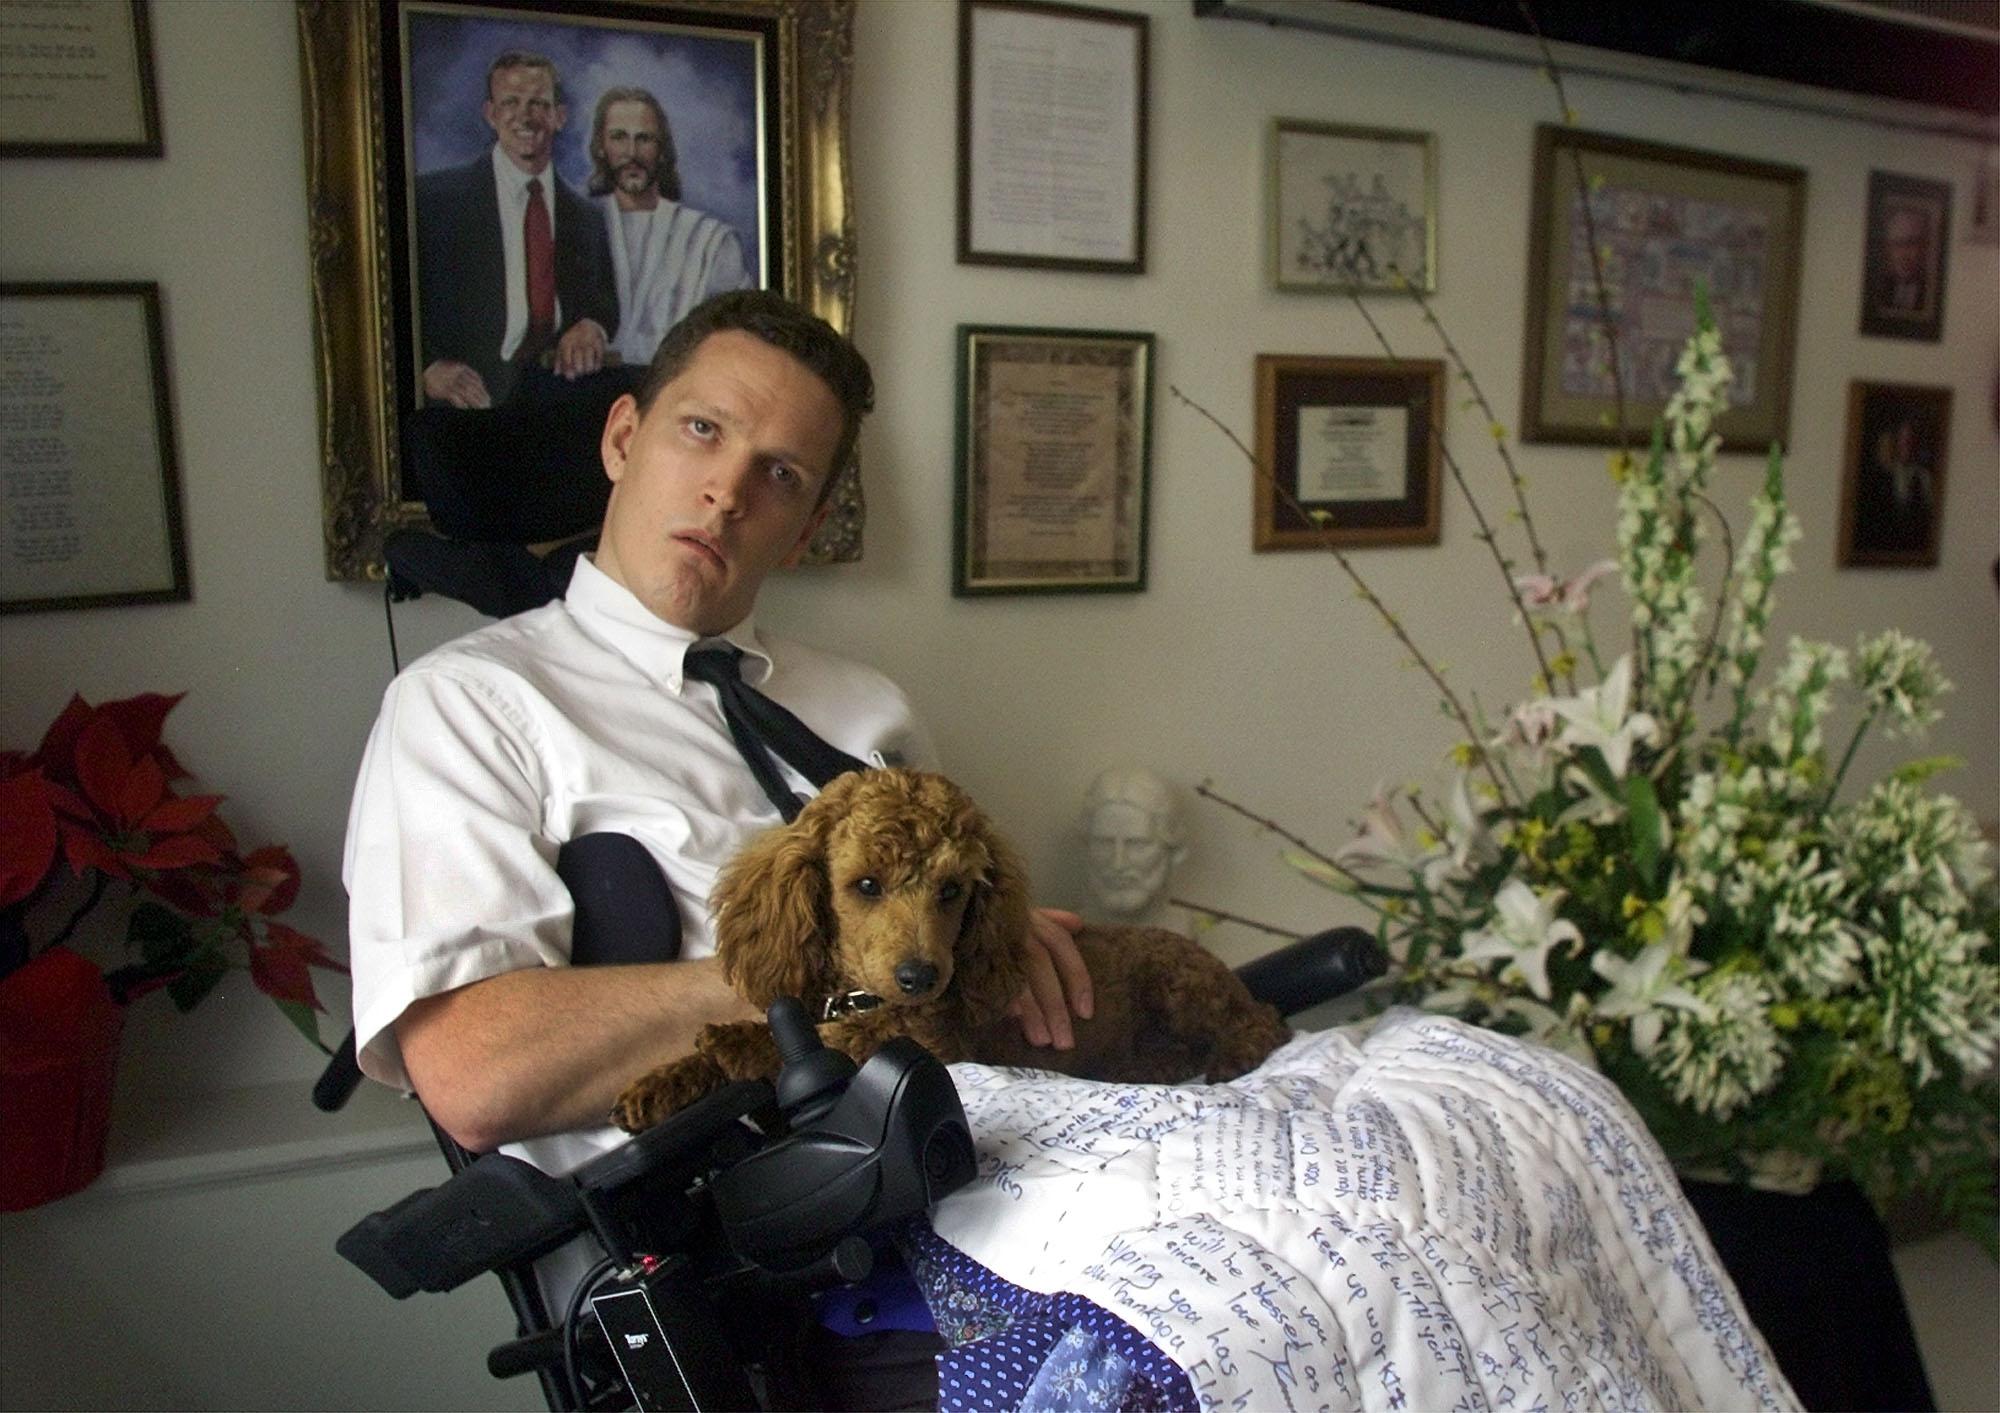 Elder Orin Voorheis of Pleasant Grove with his new dog Rusty.